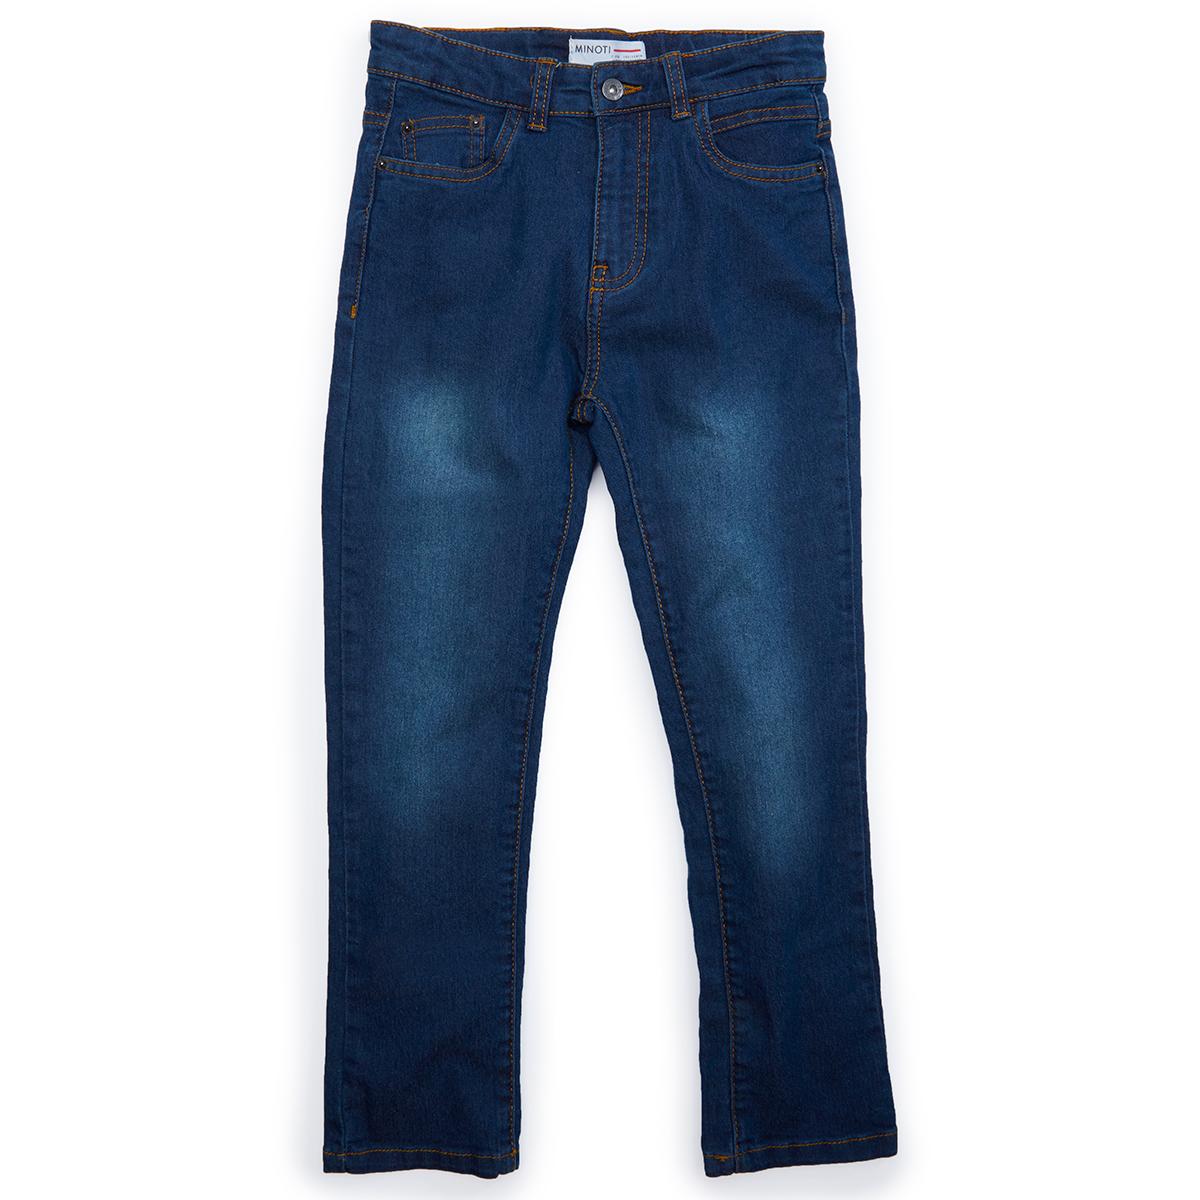 Minoti Little Boys' Denim Jeans - Blue, 7-8X